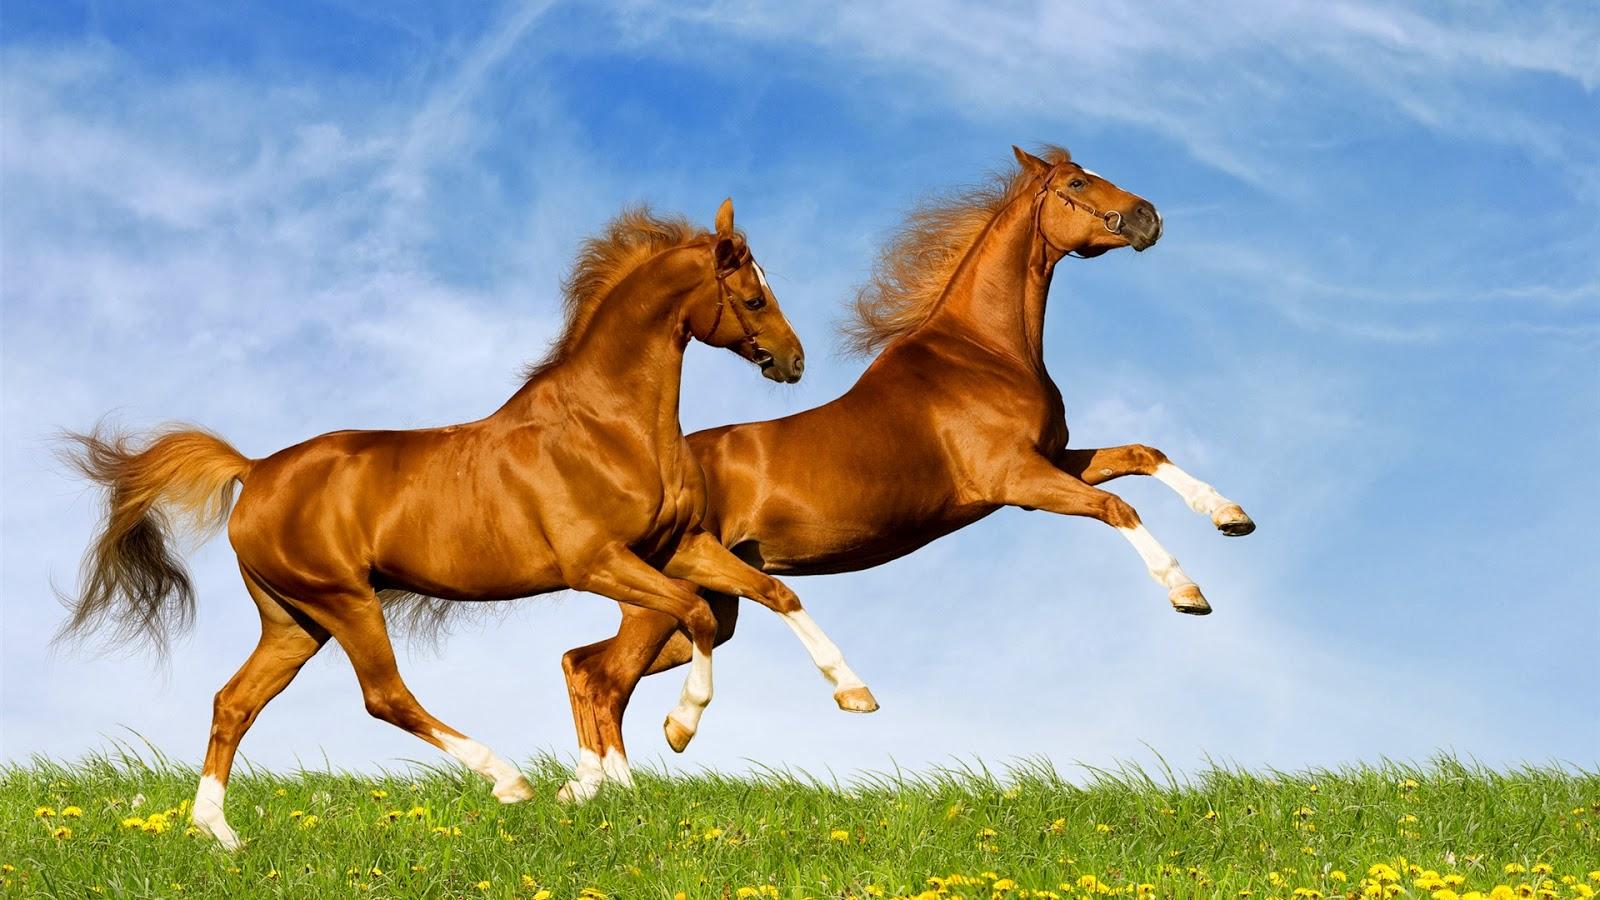 wallpapers desktop horse and make this HD wallpapers desktop 1600x900